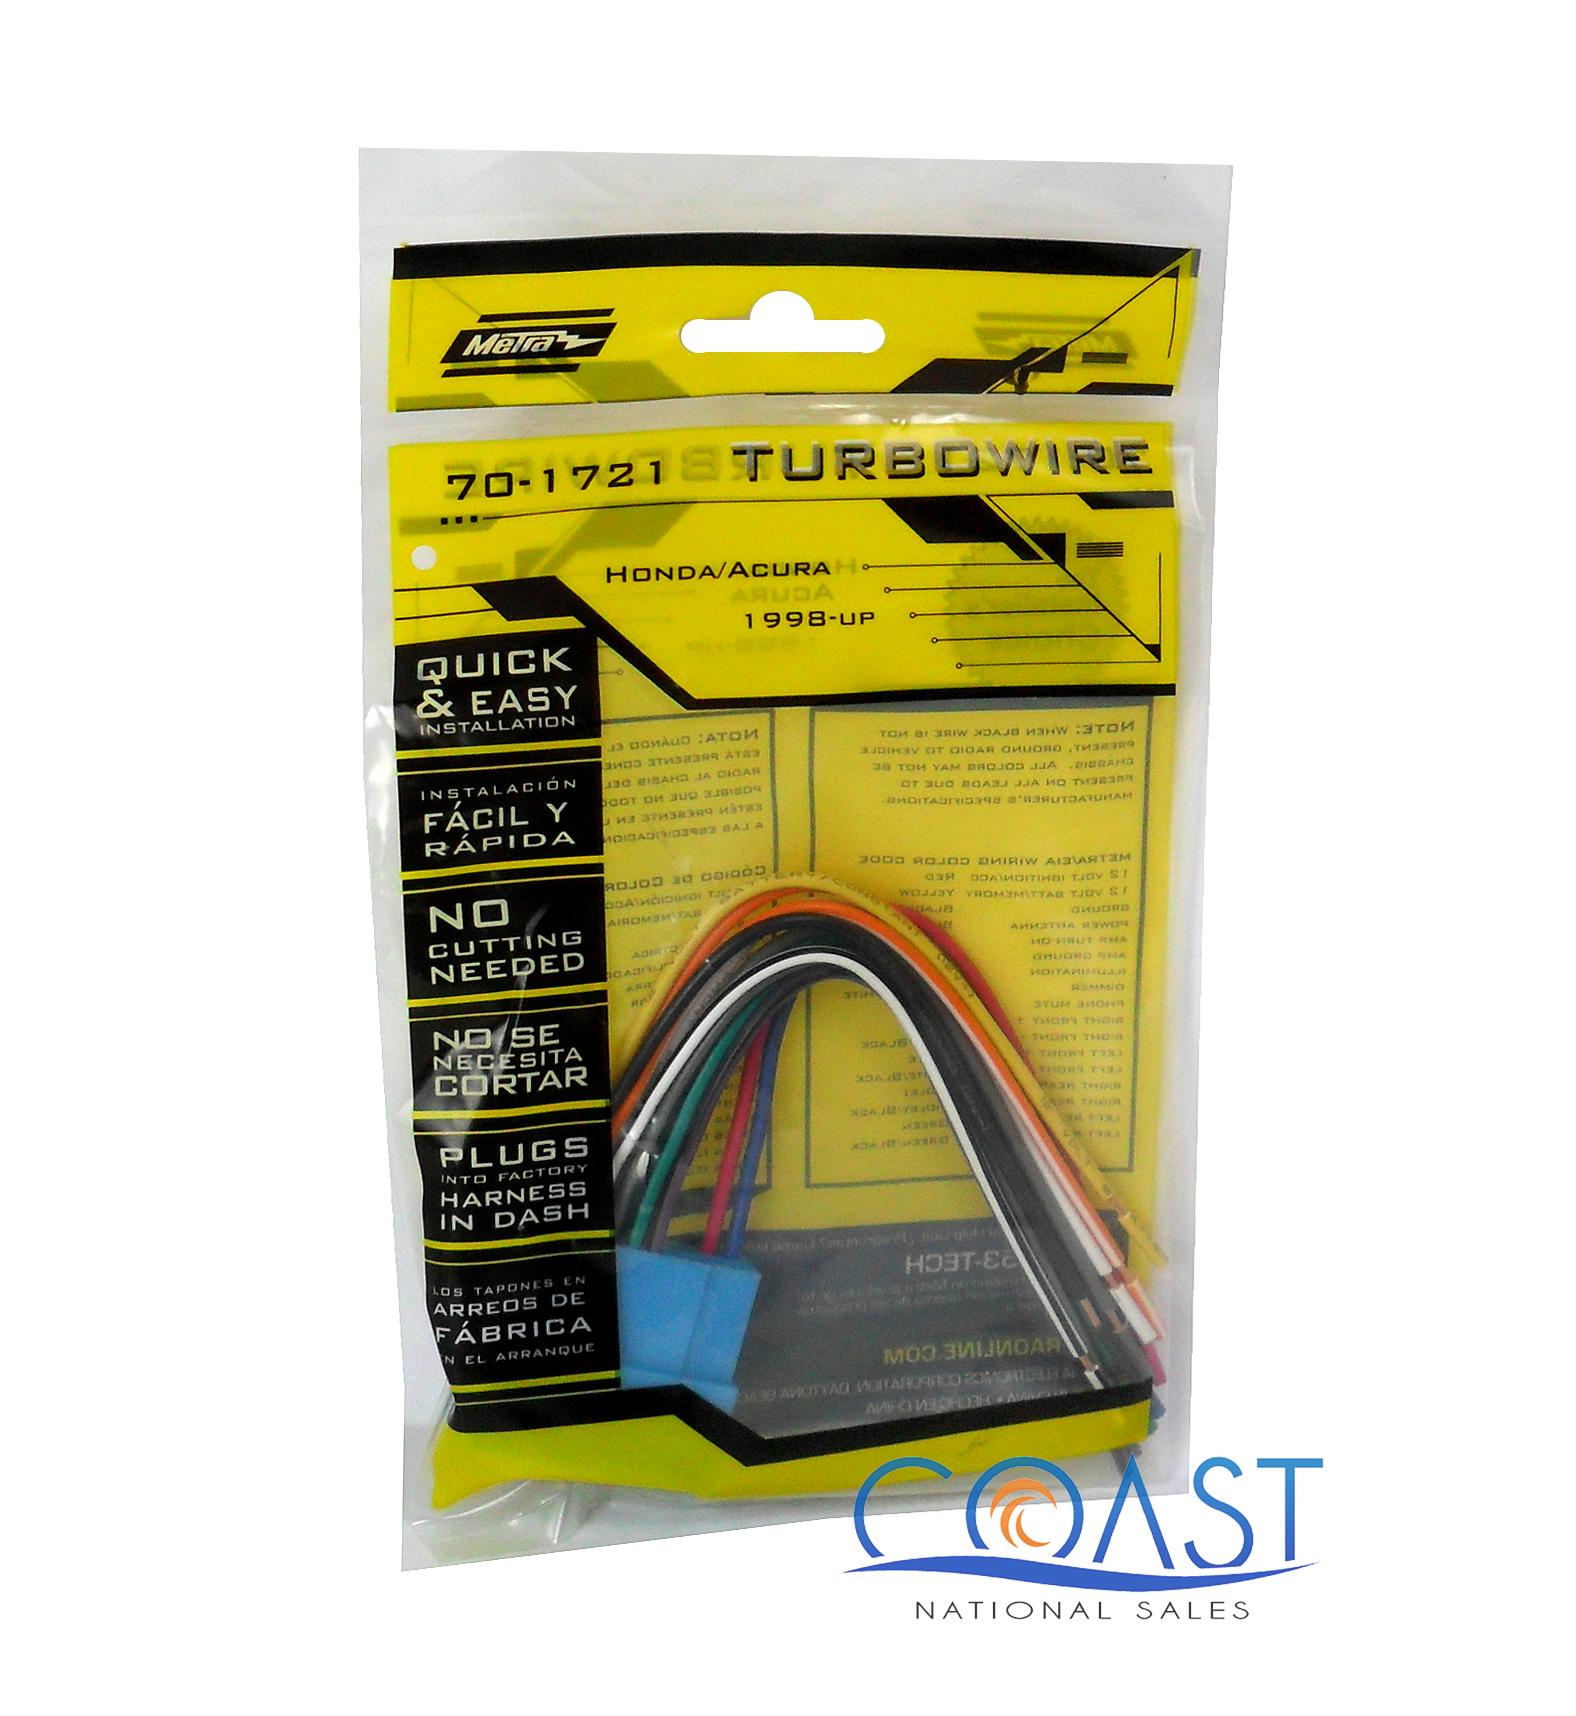 70 1721 2 metra 70 1721 radio wiring harness metra 70 1721 honda 98 up metra 70-1721 receiver wiring harness at gsmx.co